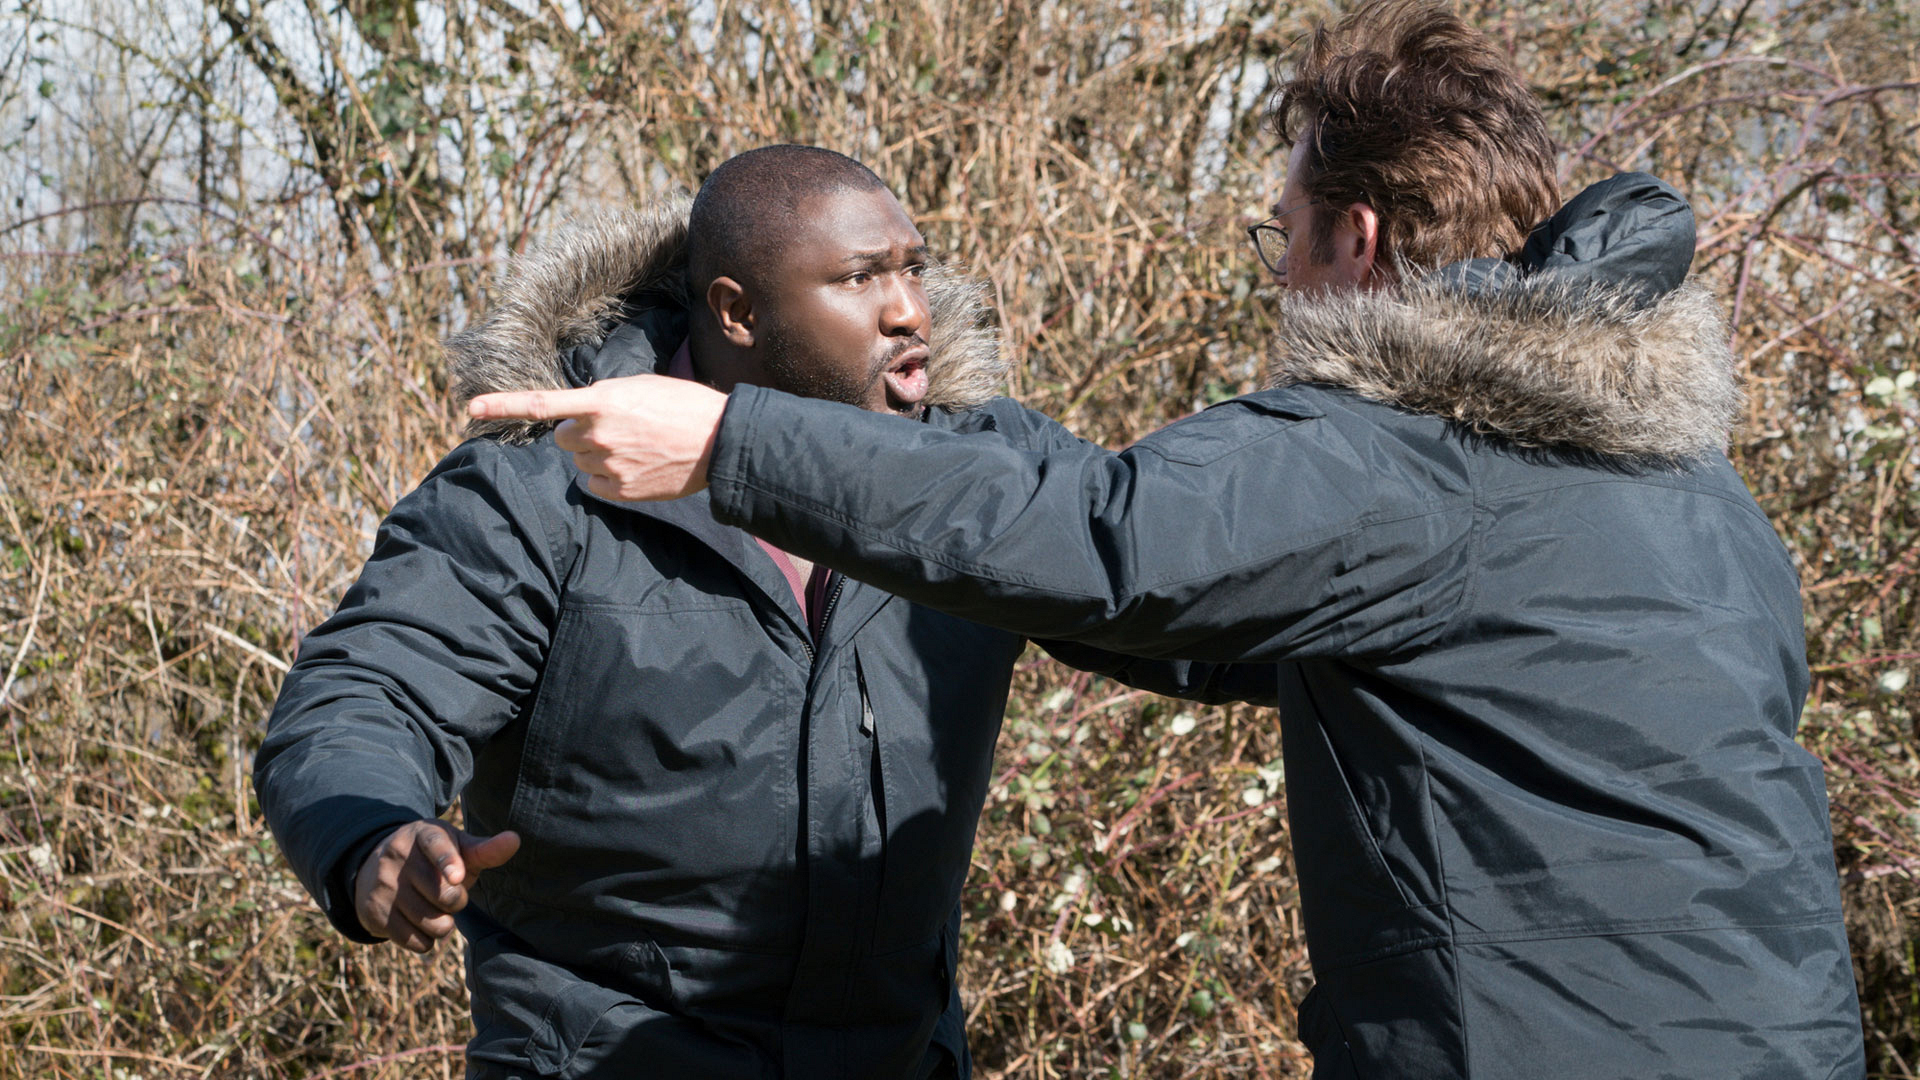 Abraham Kenyatta and Mitch Morgan have a heated conversation.